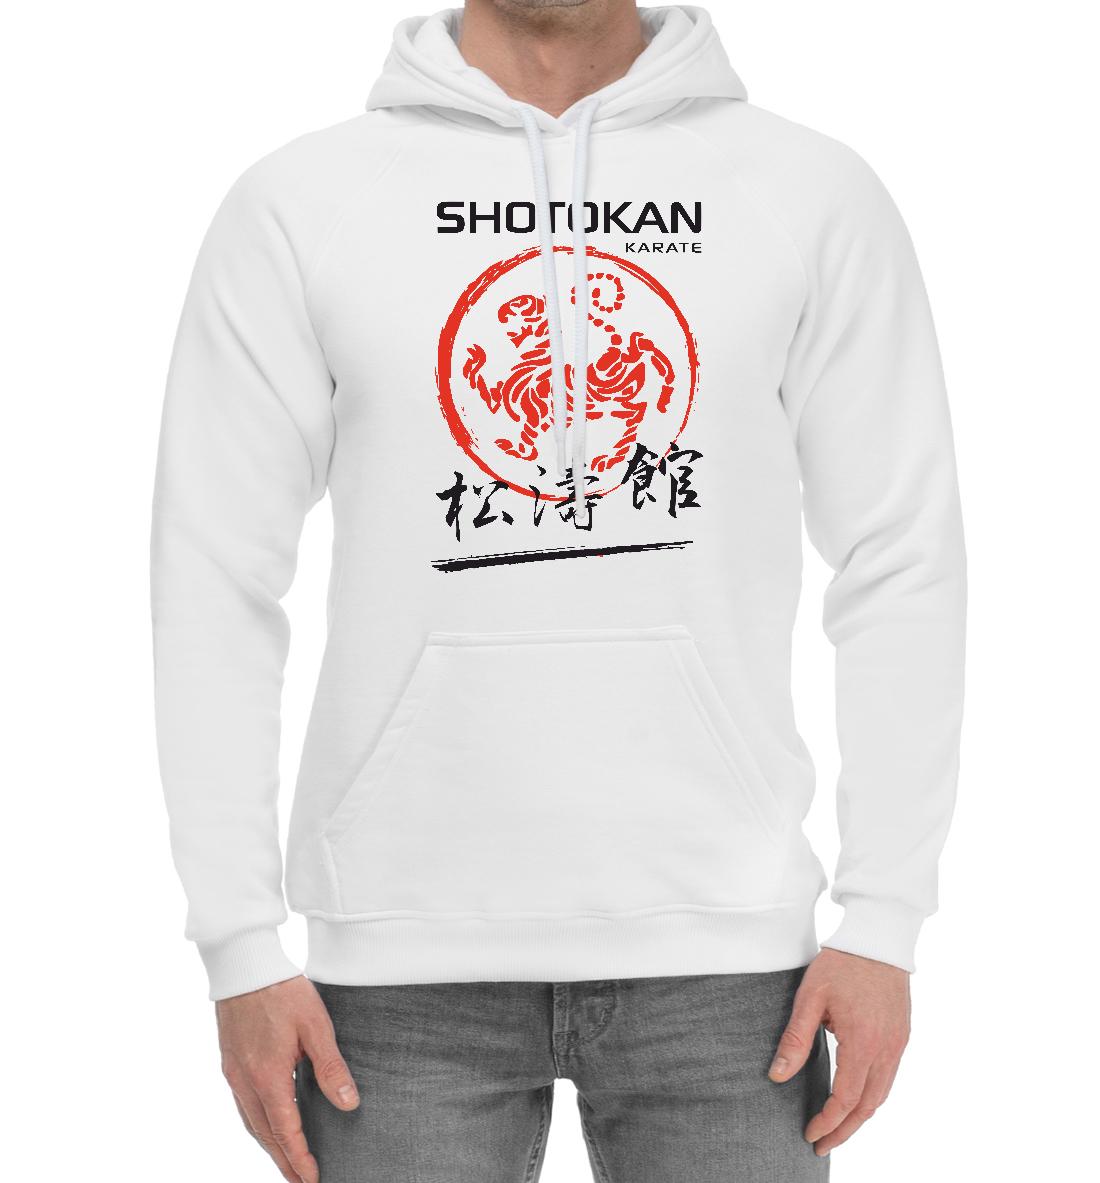 «Shotokan Karate» — хлопковый мужской, артикул: KRT-587119-hhu-2